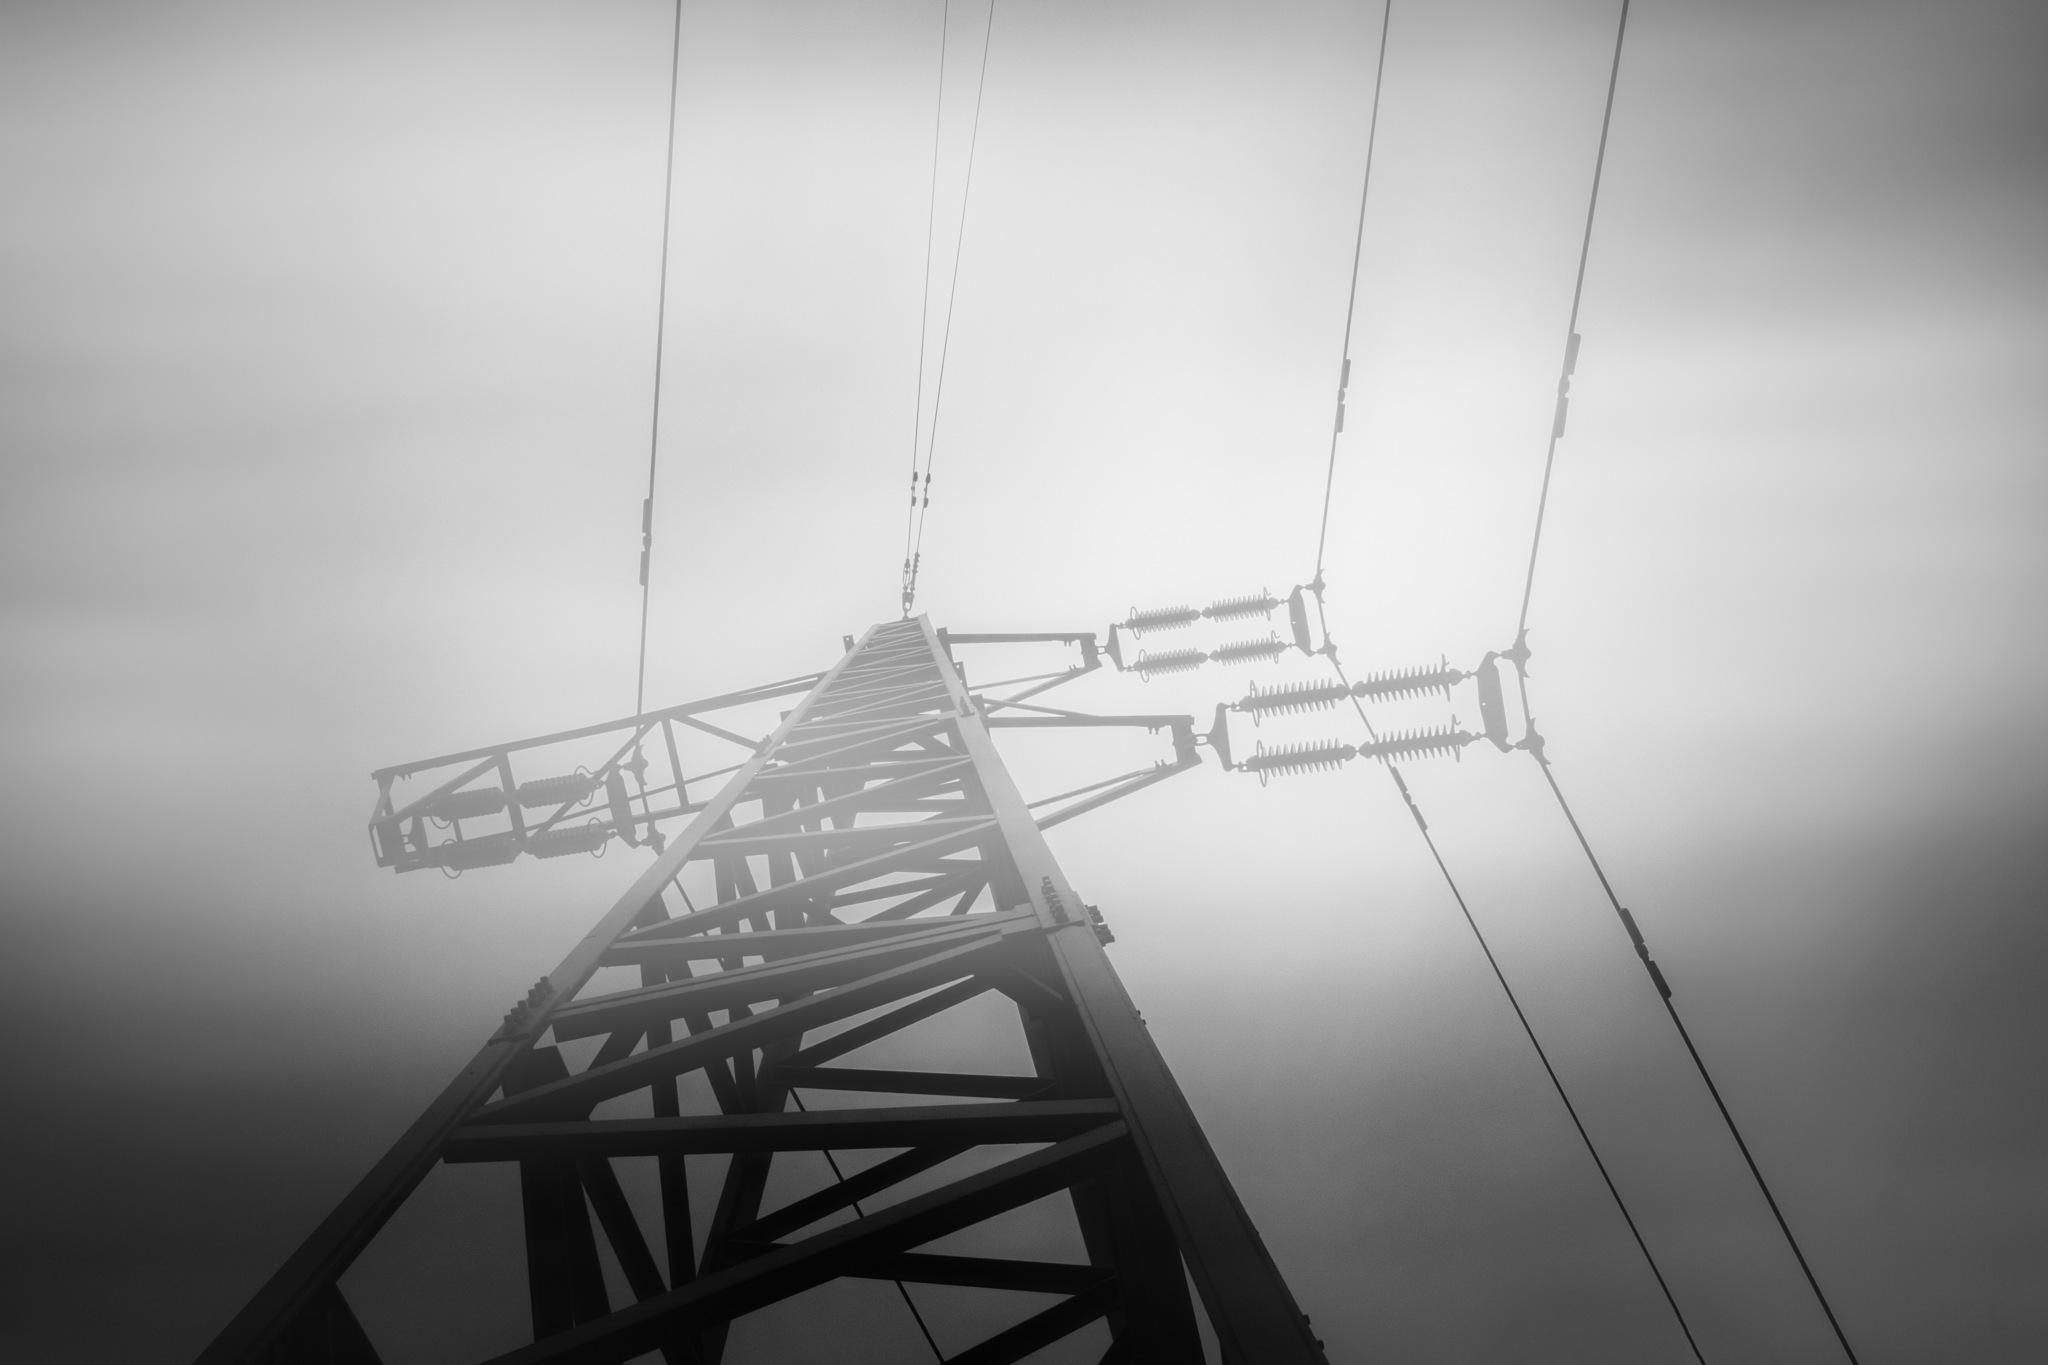 Power lines by Michael B. Rasmussen